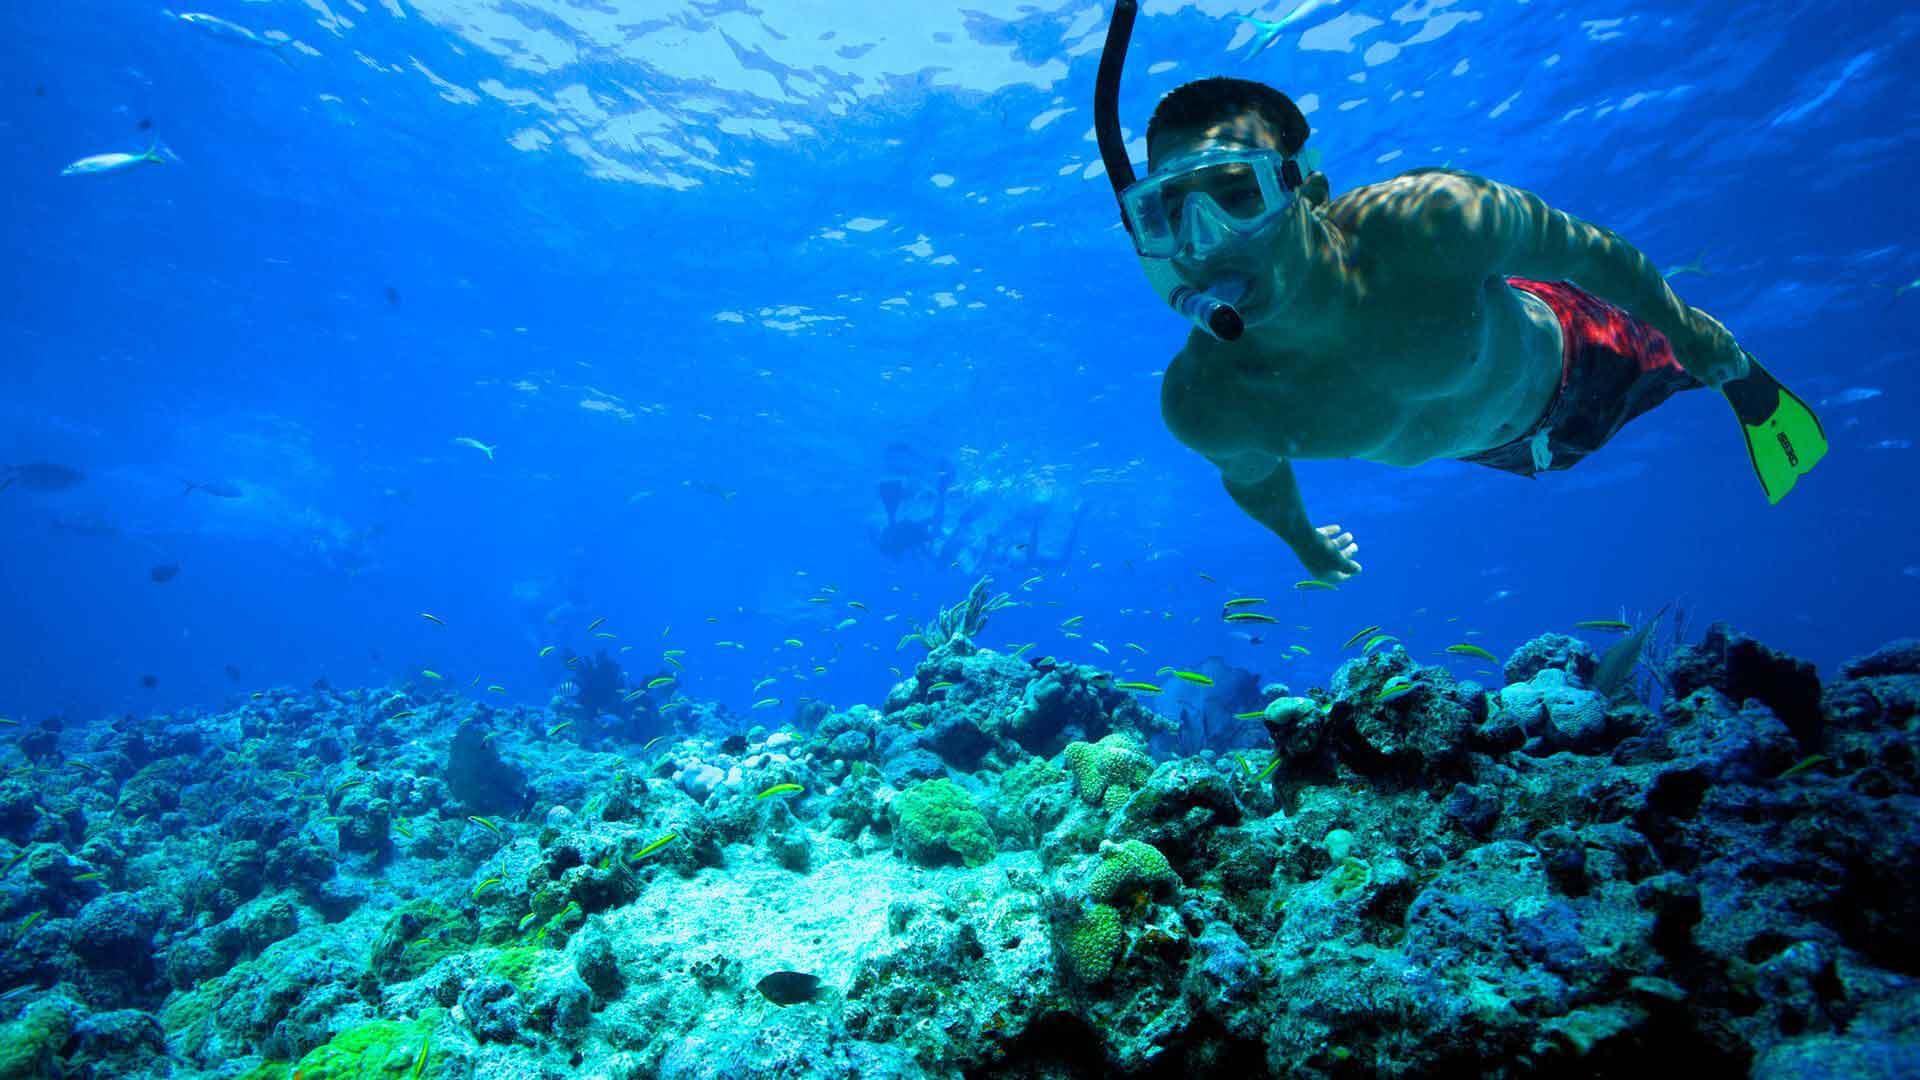 excursion-isla-mujeres-riviera-maya-sl-2-o